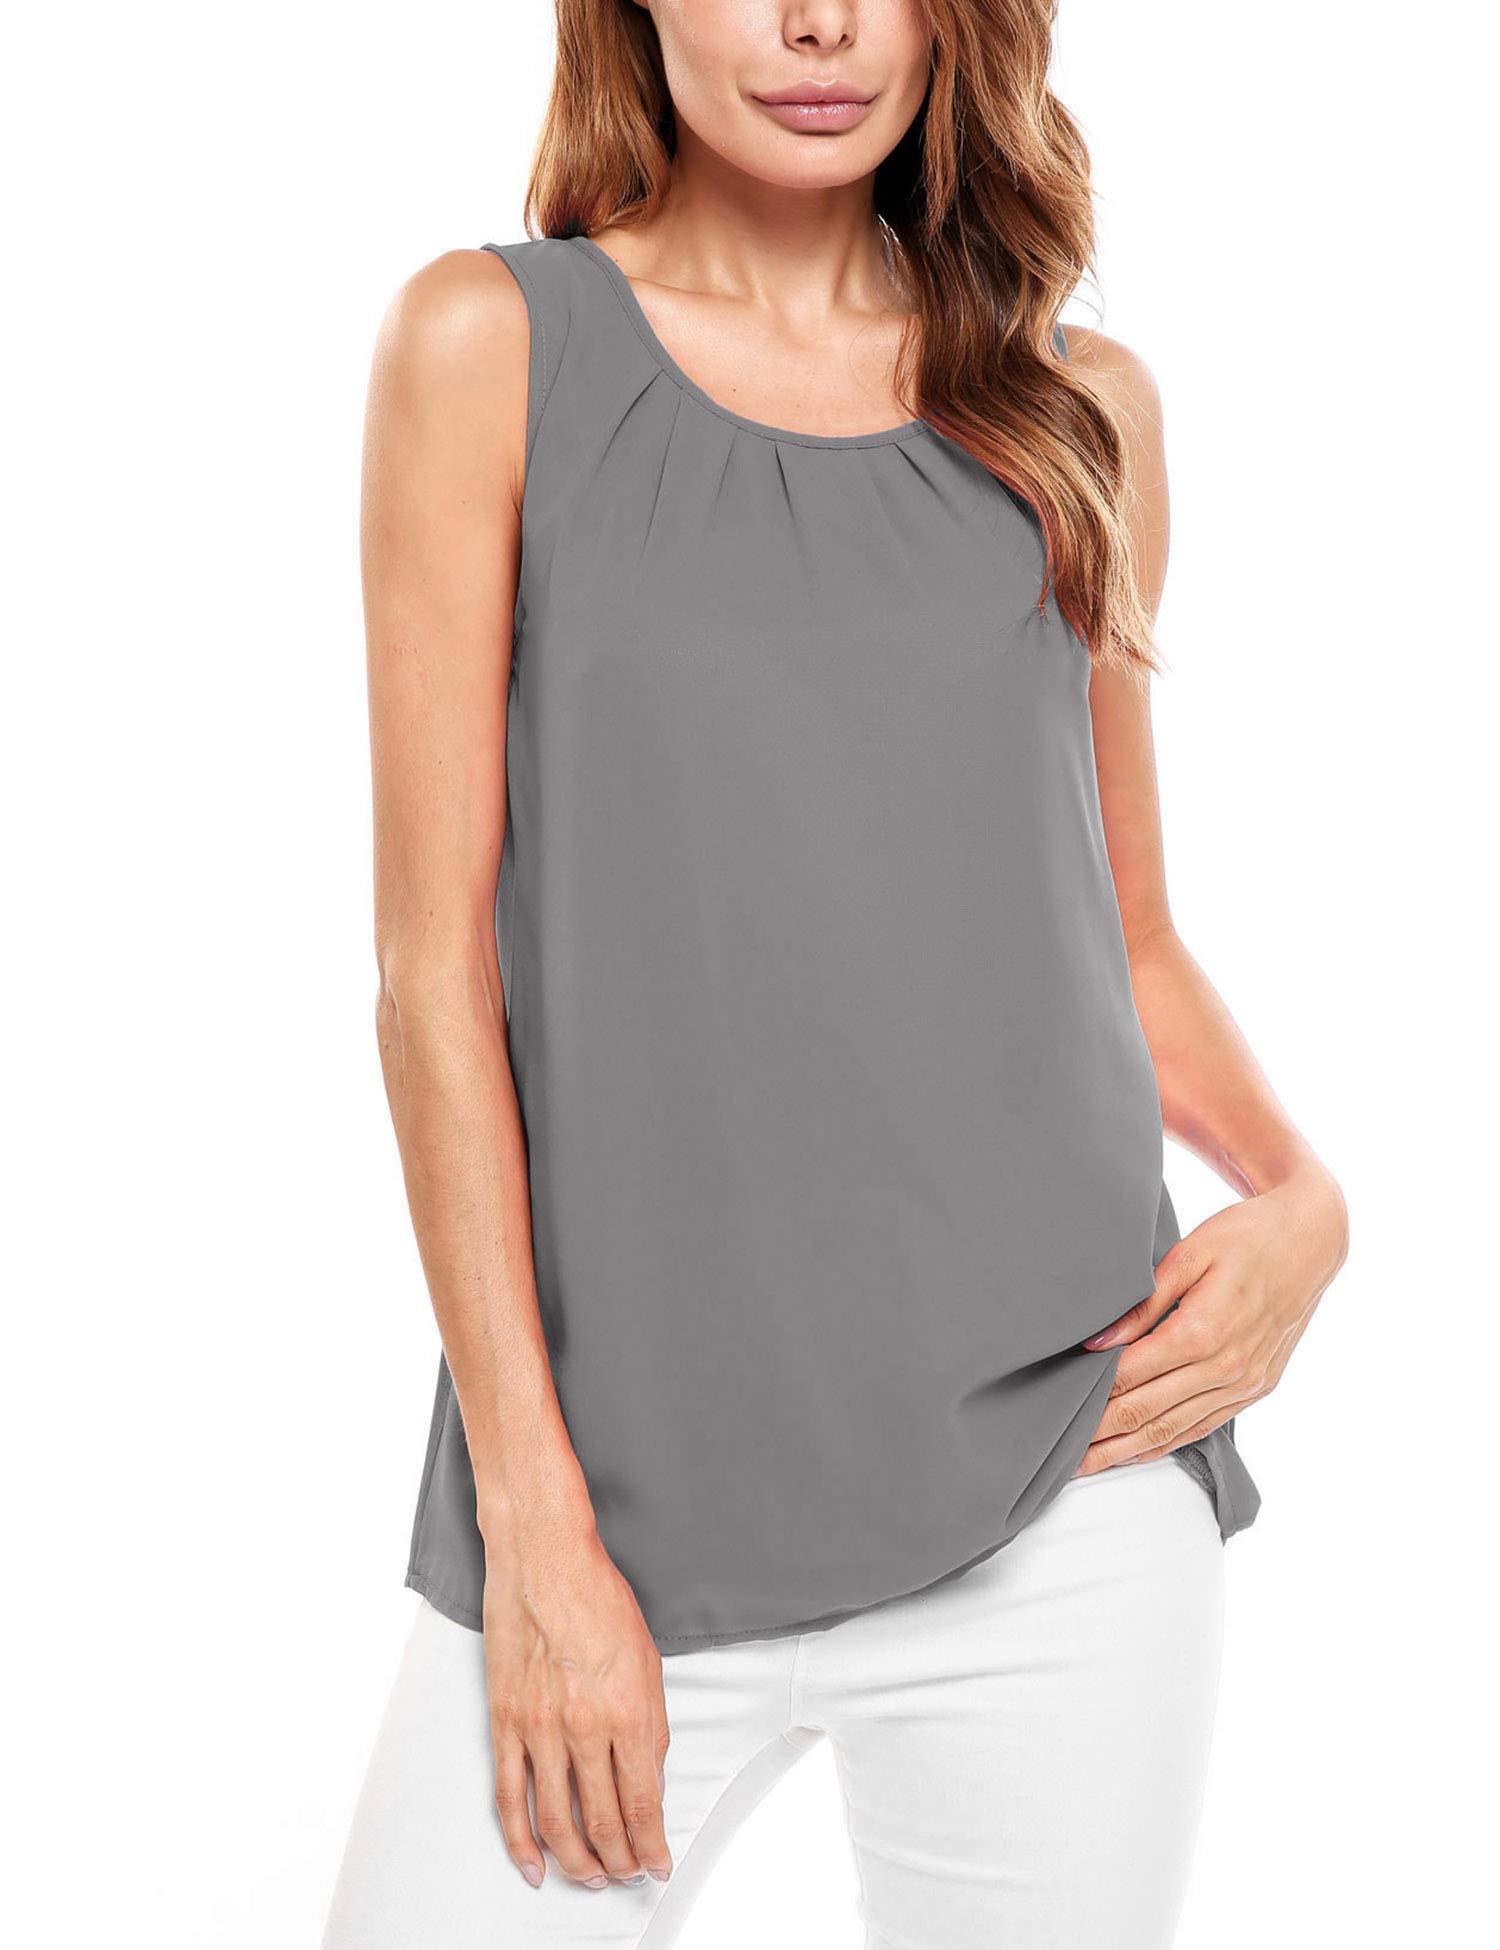 Beyove Women's Casual Summer Chiffon Keyhole Tank Top Sleeveless Blouse Shirt (XX-Large, Grey-1)